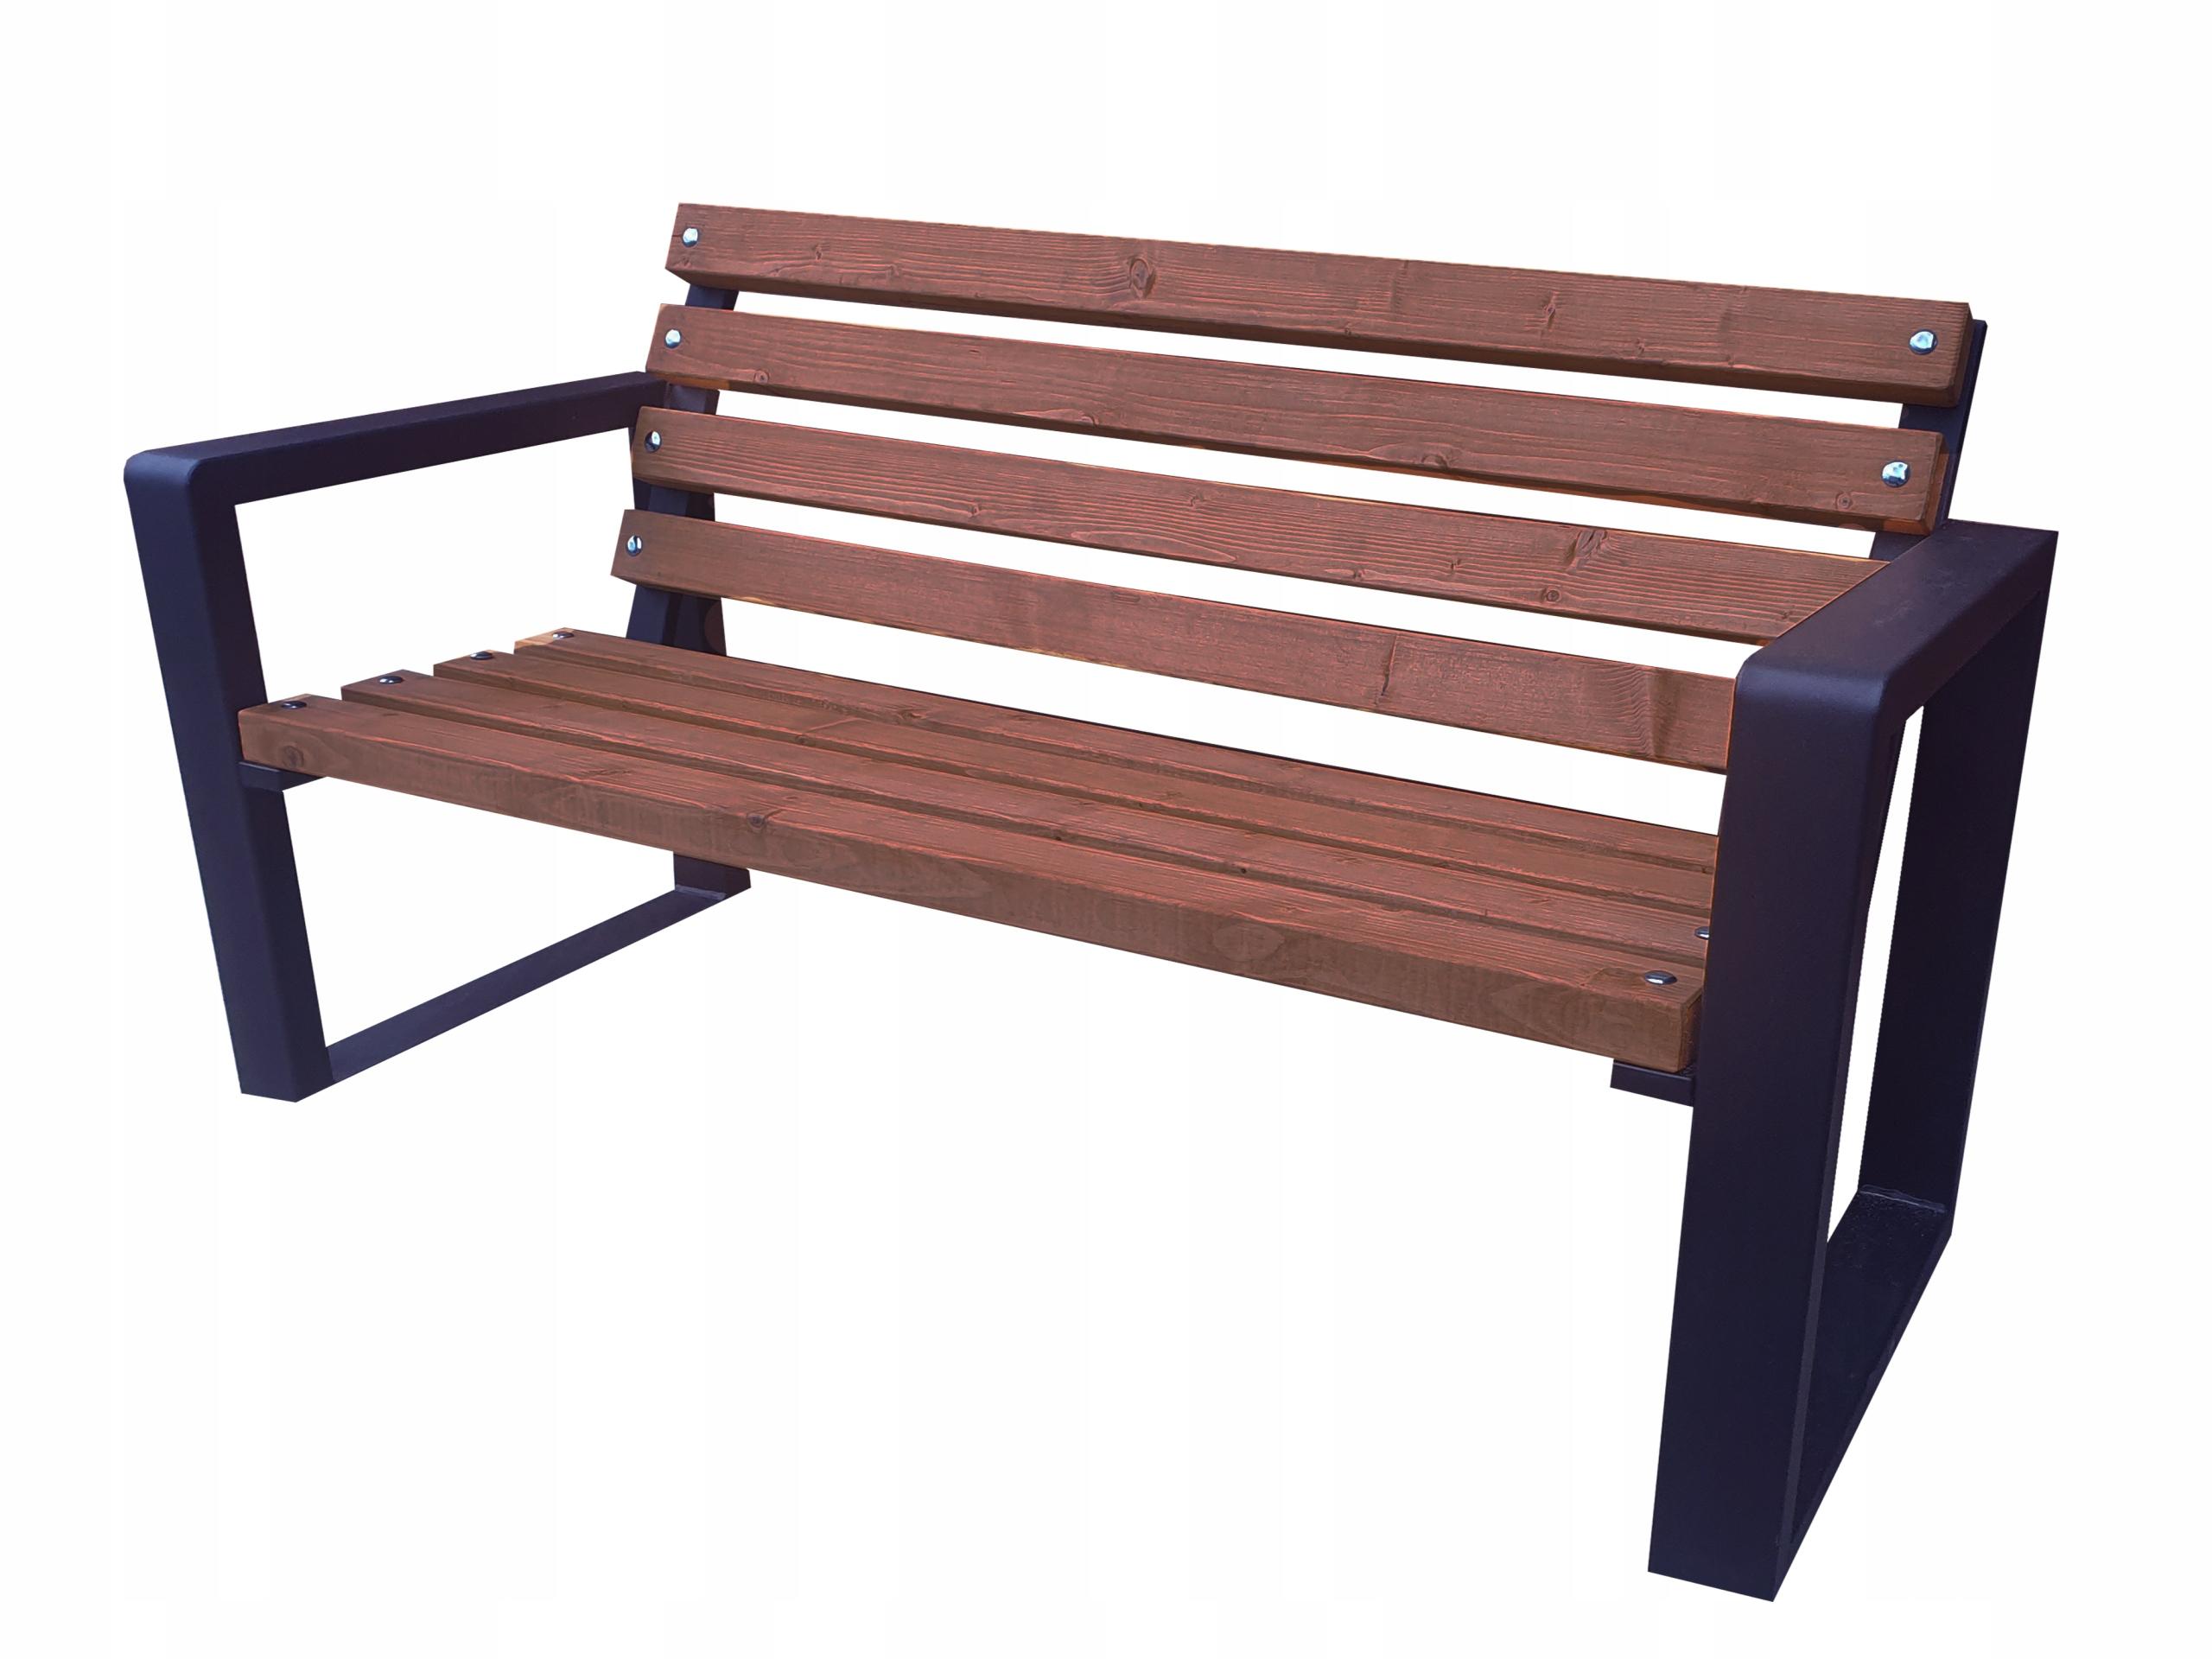 Mestská lavica 180 cm.Výrobca Primario